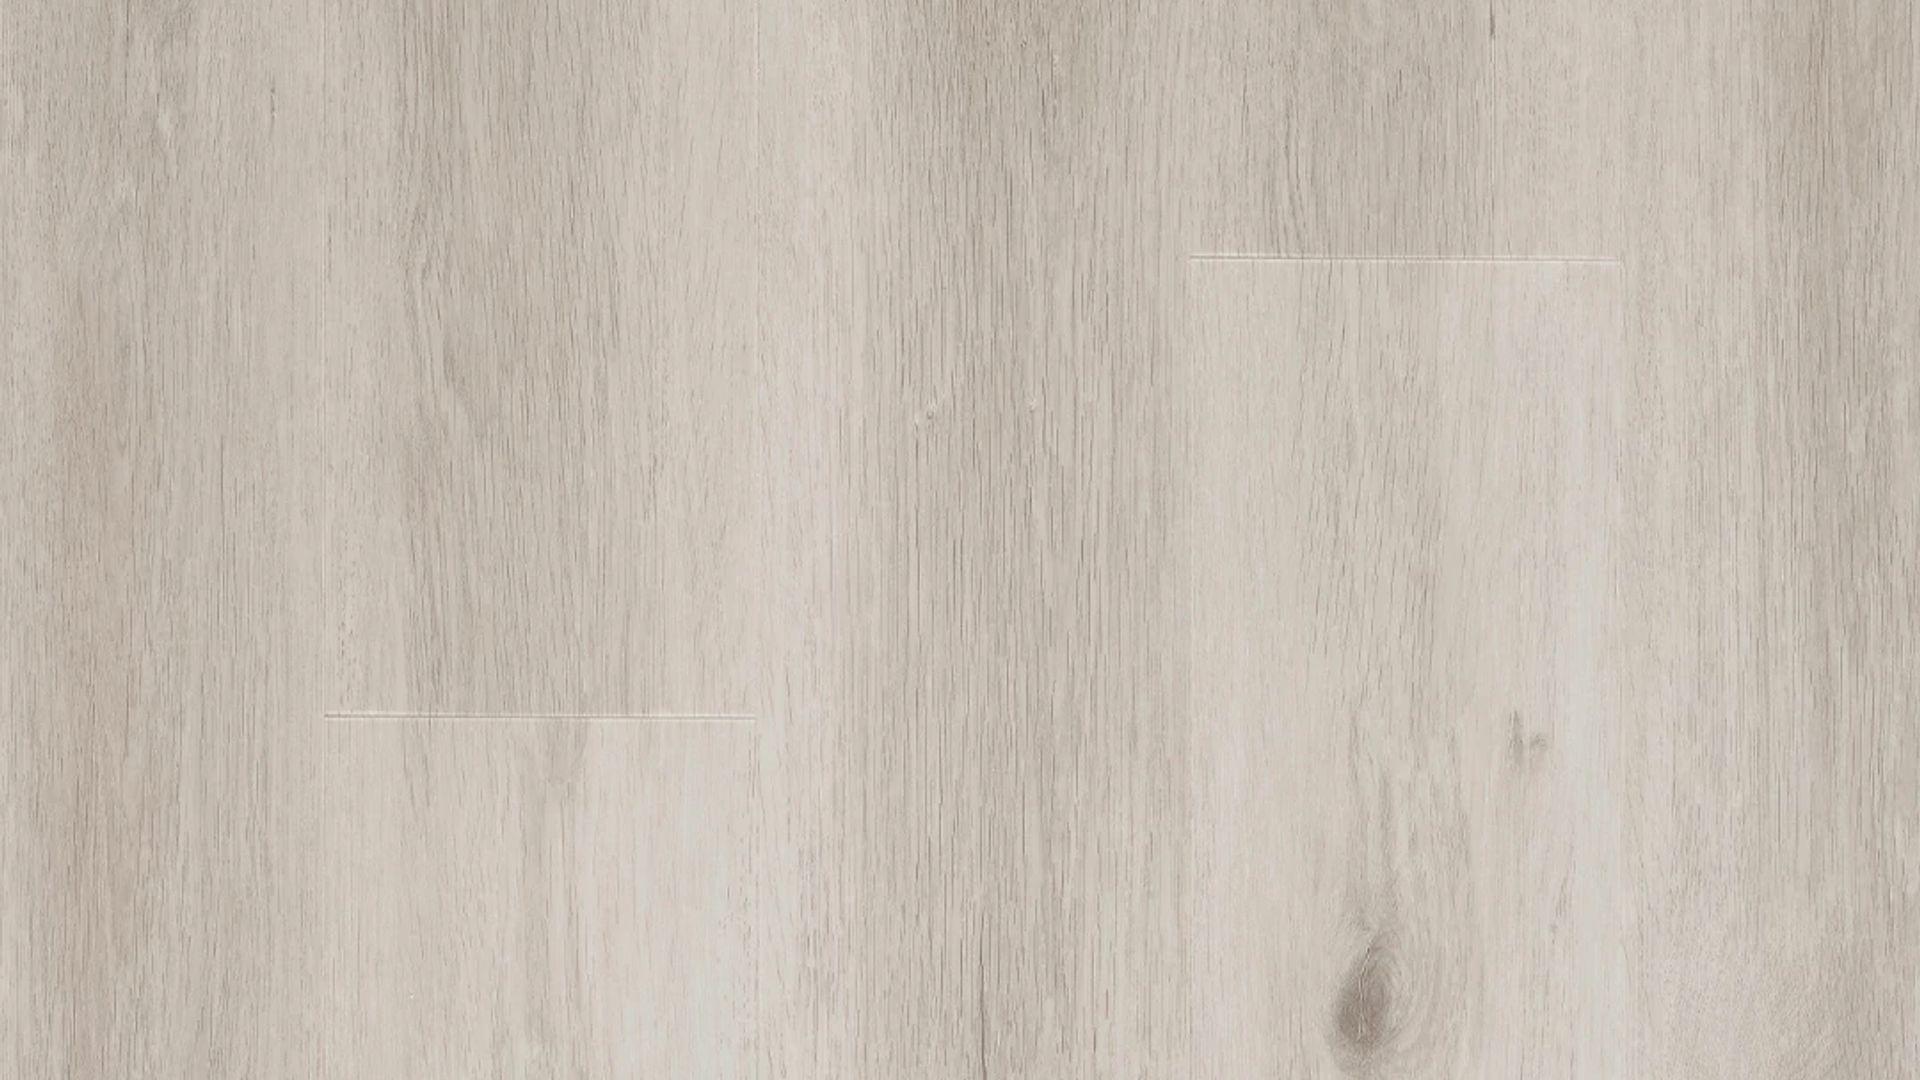 Comcast EVP Vinyl Flooring Product Shot